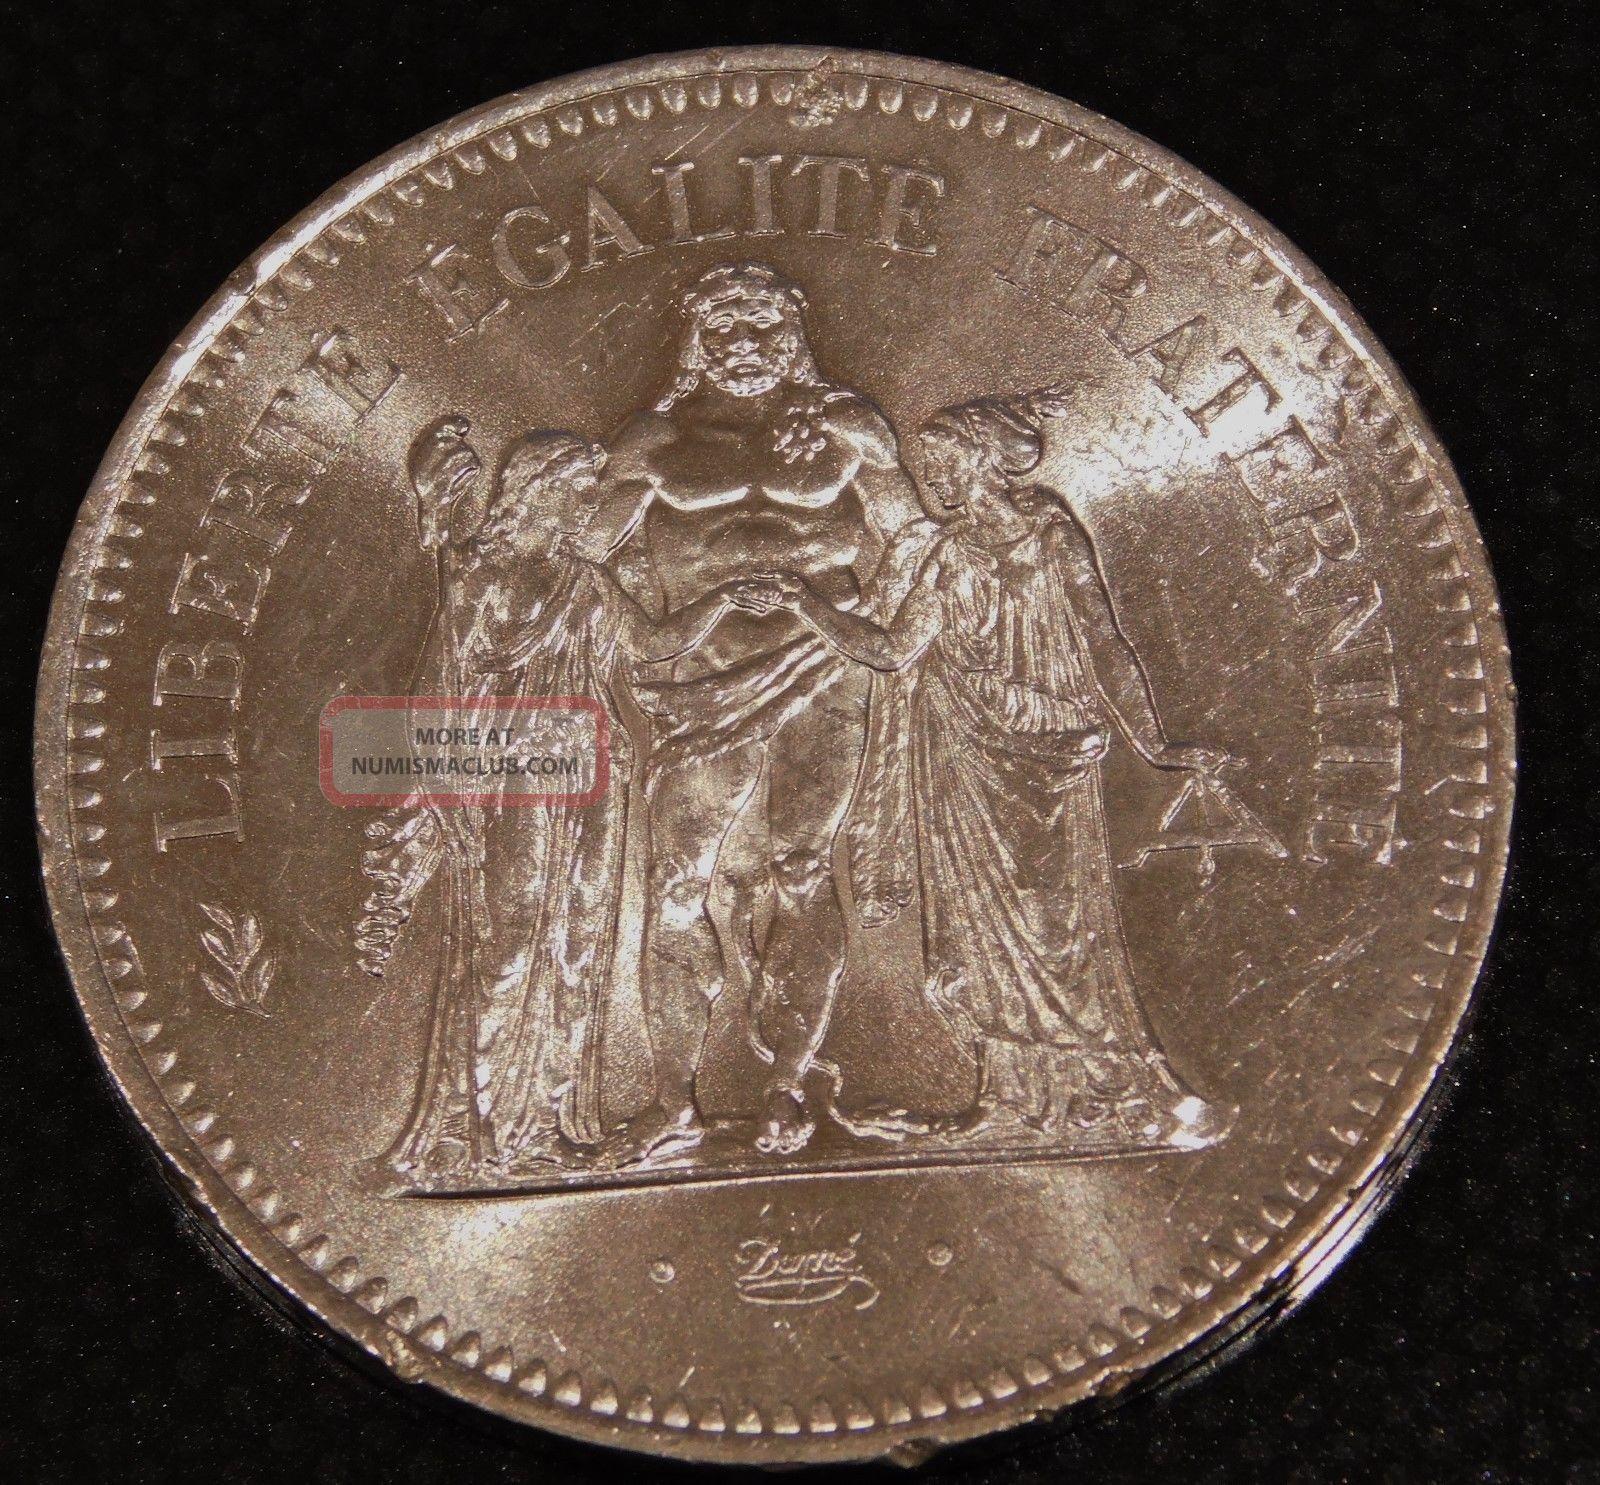 France 1976 50 Francs Silver Dollar Size Coin France photo